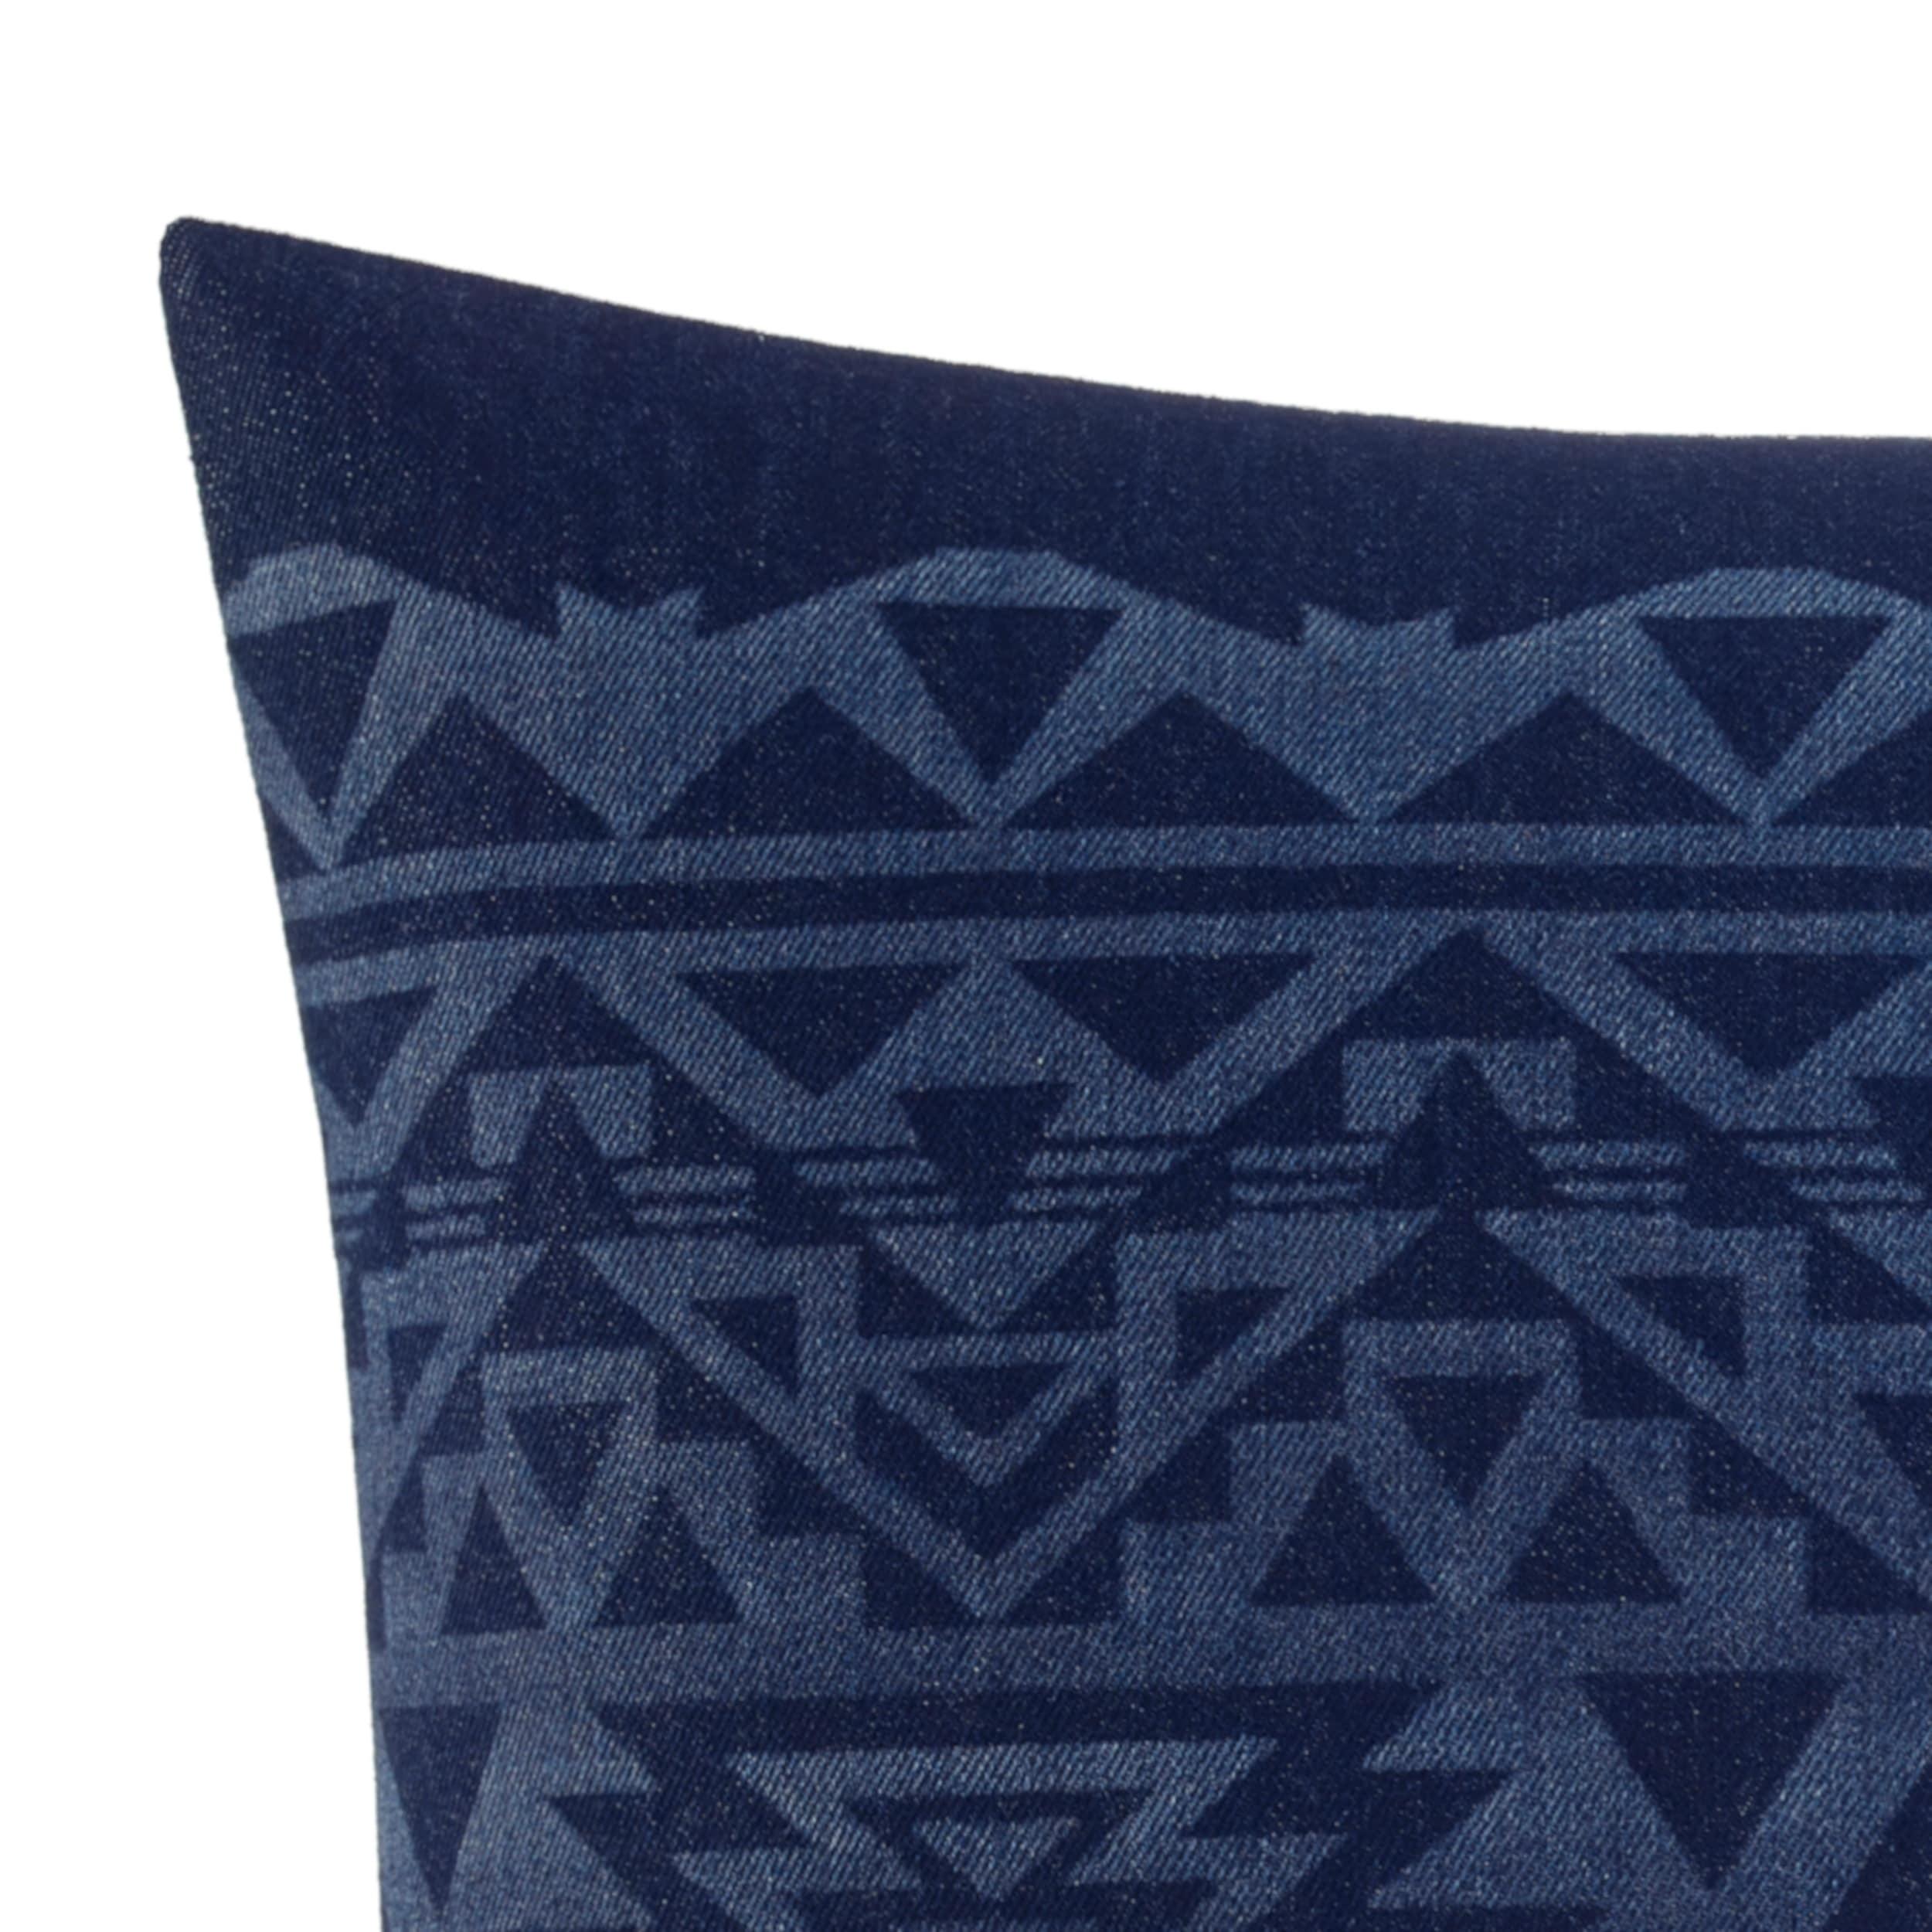 eddie bauer crescent lake blue 20 x 20 decorative pillow